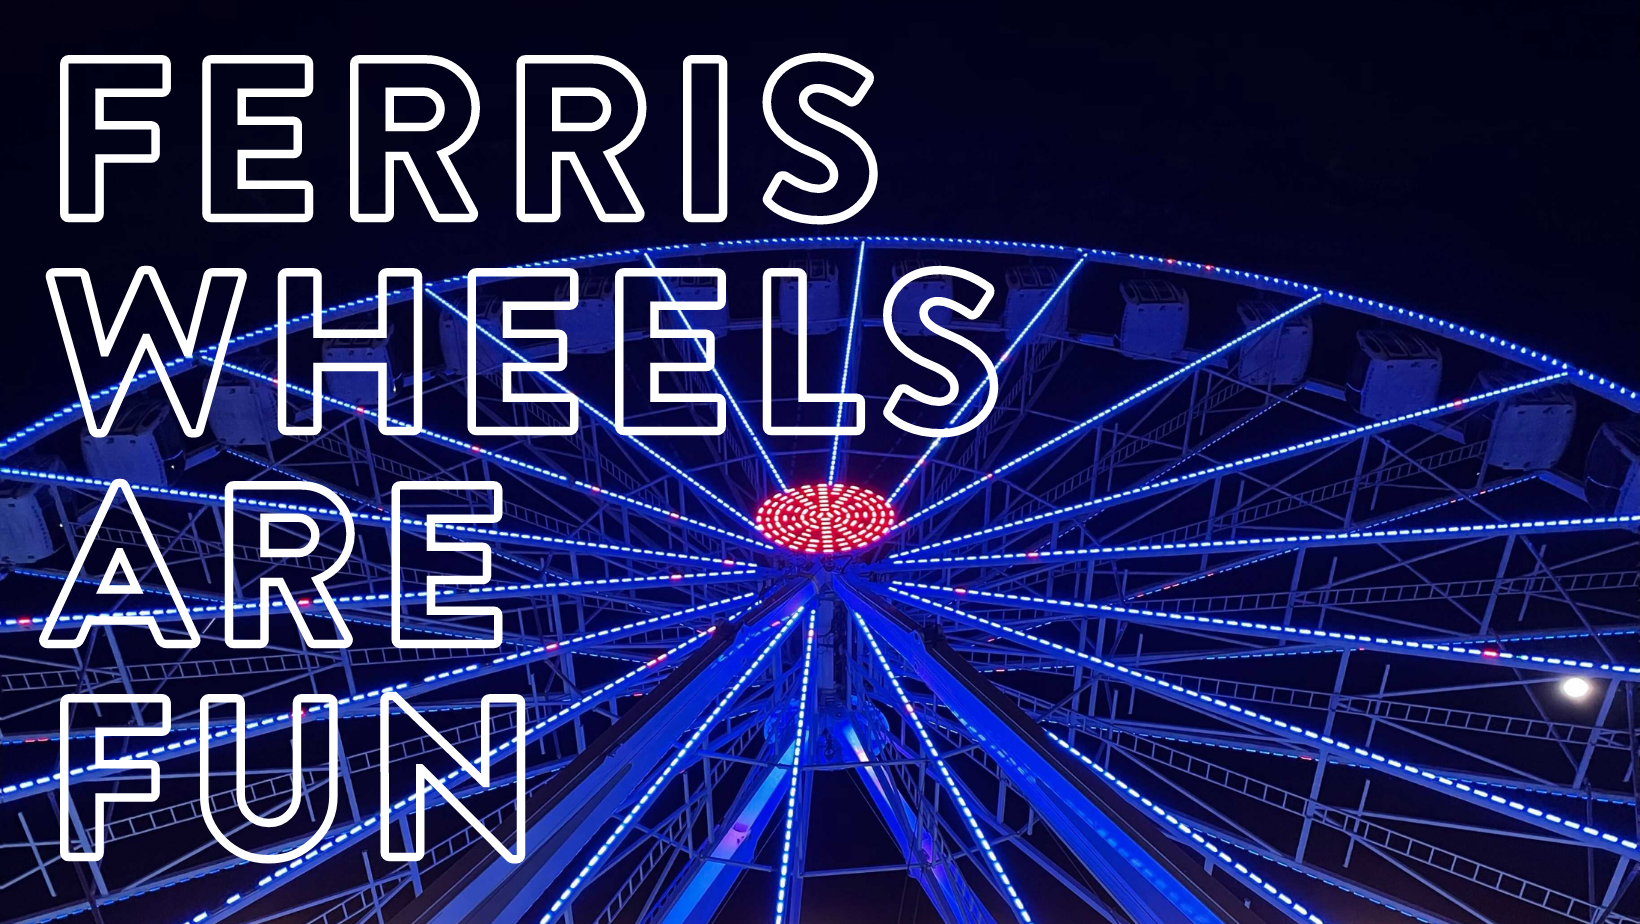 Ferris_wheels_are_fun